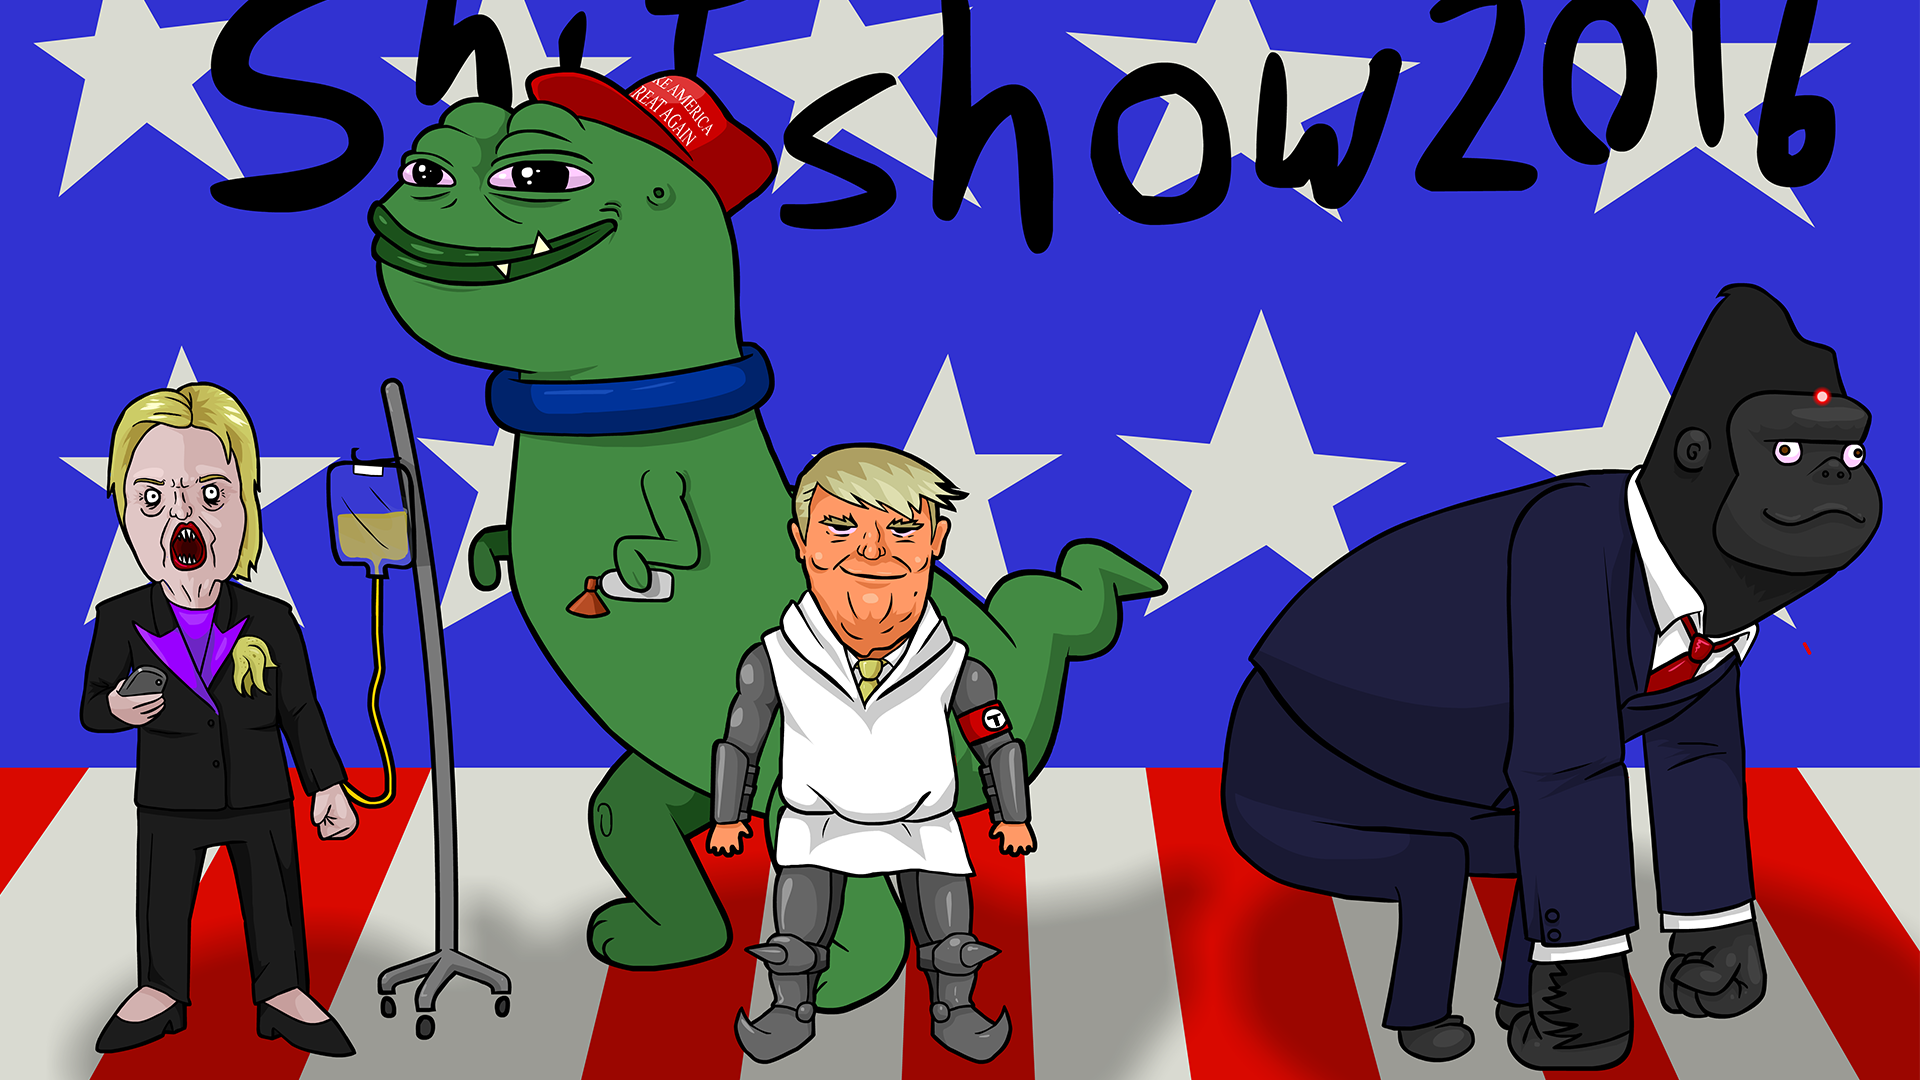 Shitshow2016